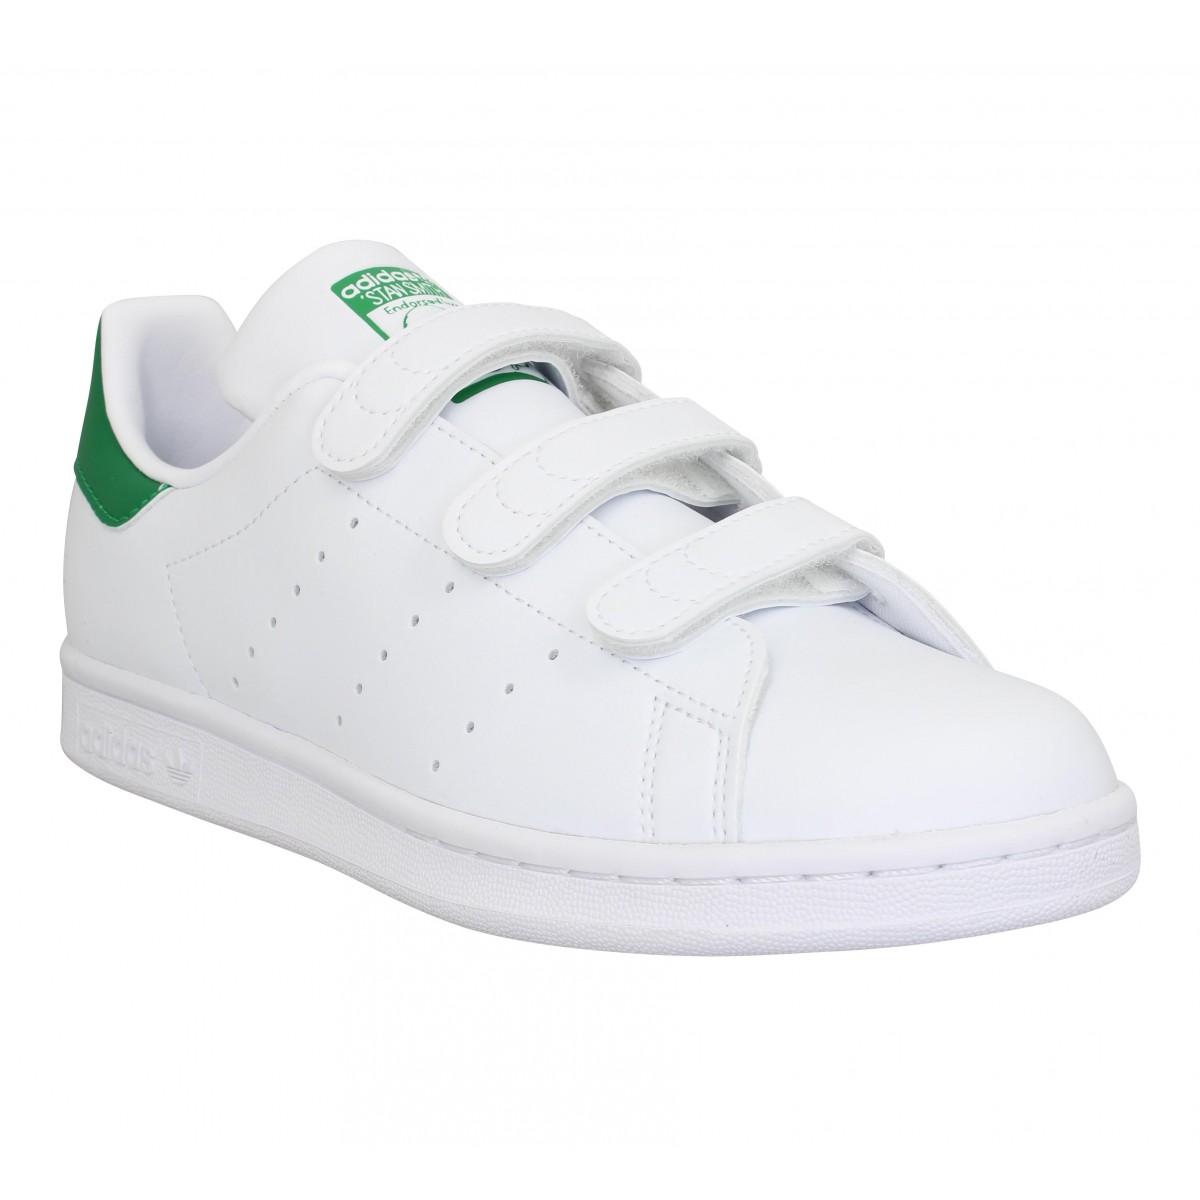 Baskets ADIDAS Stan Smith VL primegreen Blanc Vert